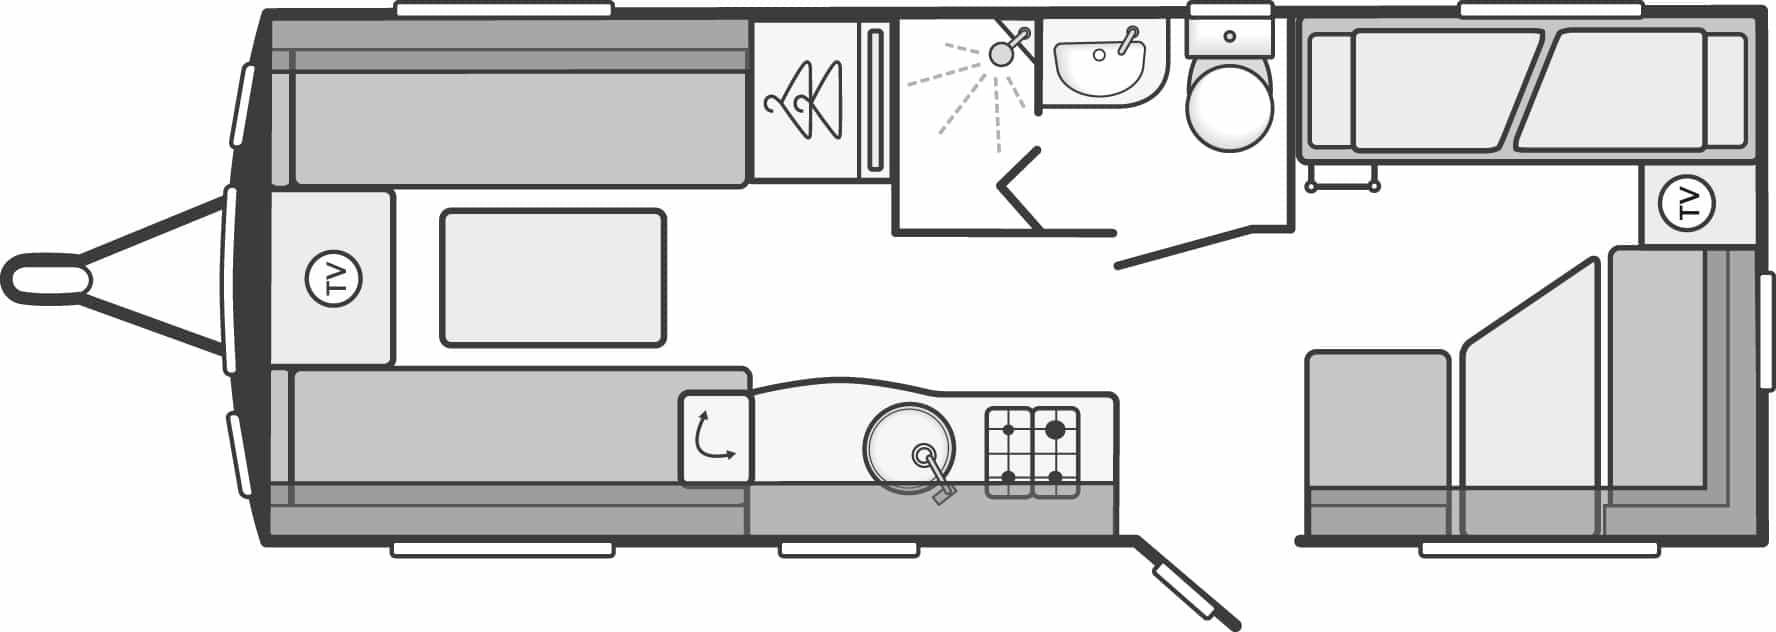 Sterling Eccles 590 - 6 Berth, Fixed Bunk Beds, End Dinette, Side Washroom